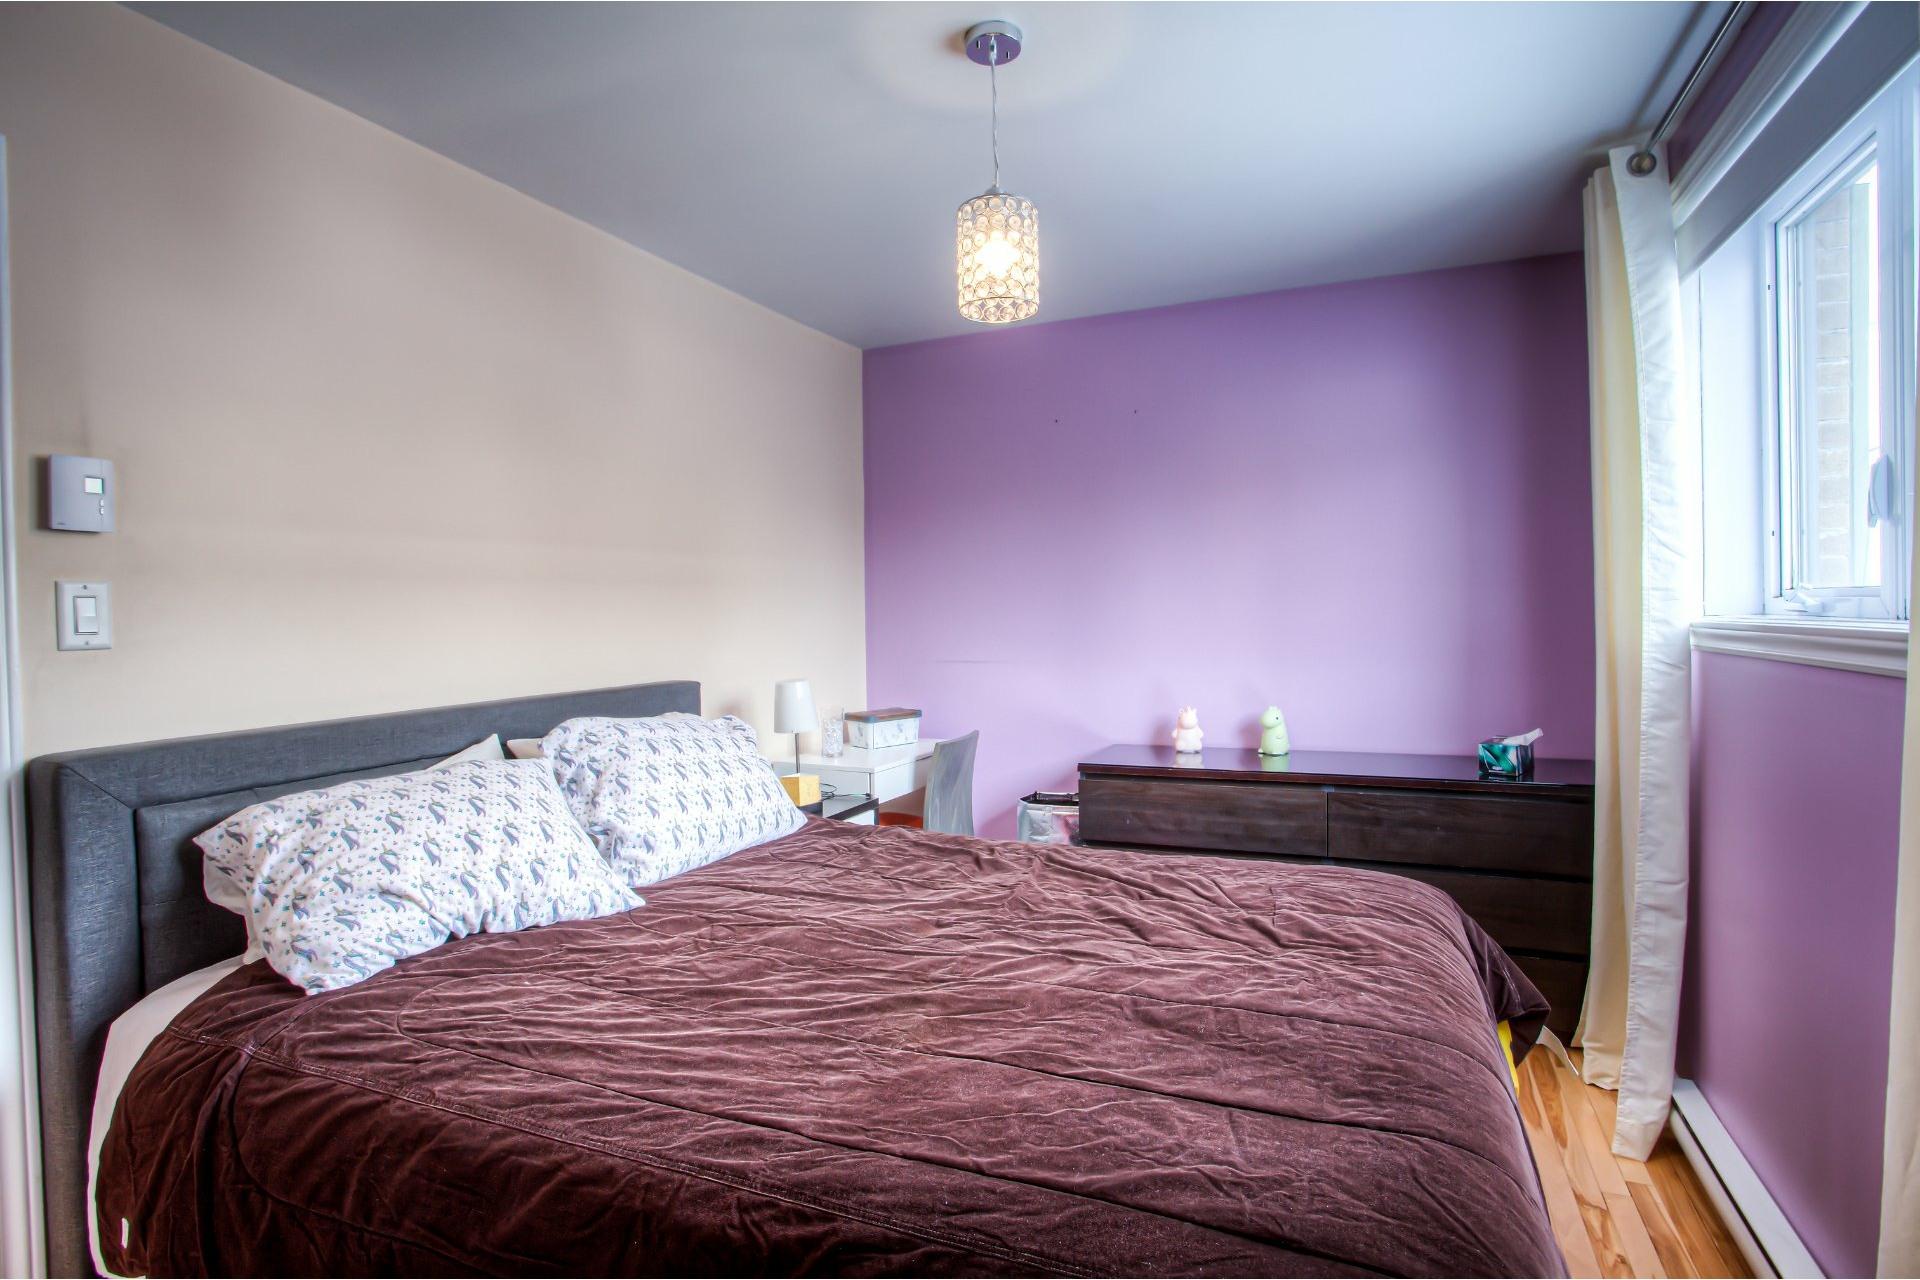 image 19 - Departamento Para alquiler Villeray/Saint-Michel/Parc-Extension Montréal  - 5 habitaciones